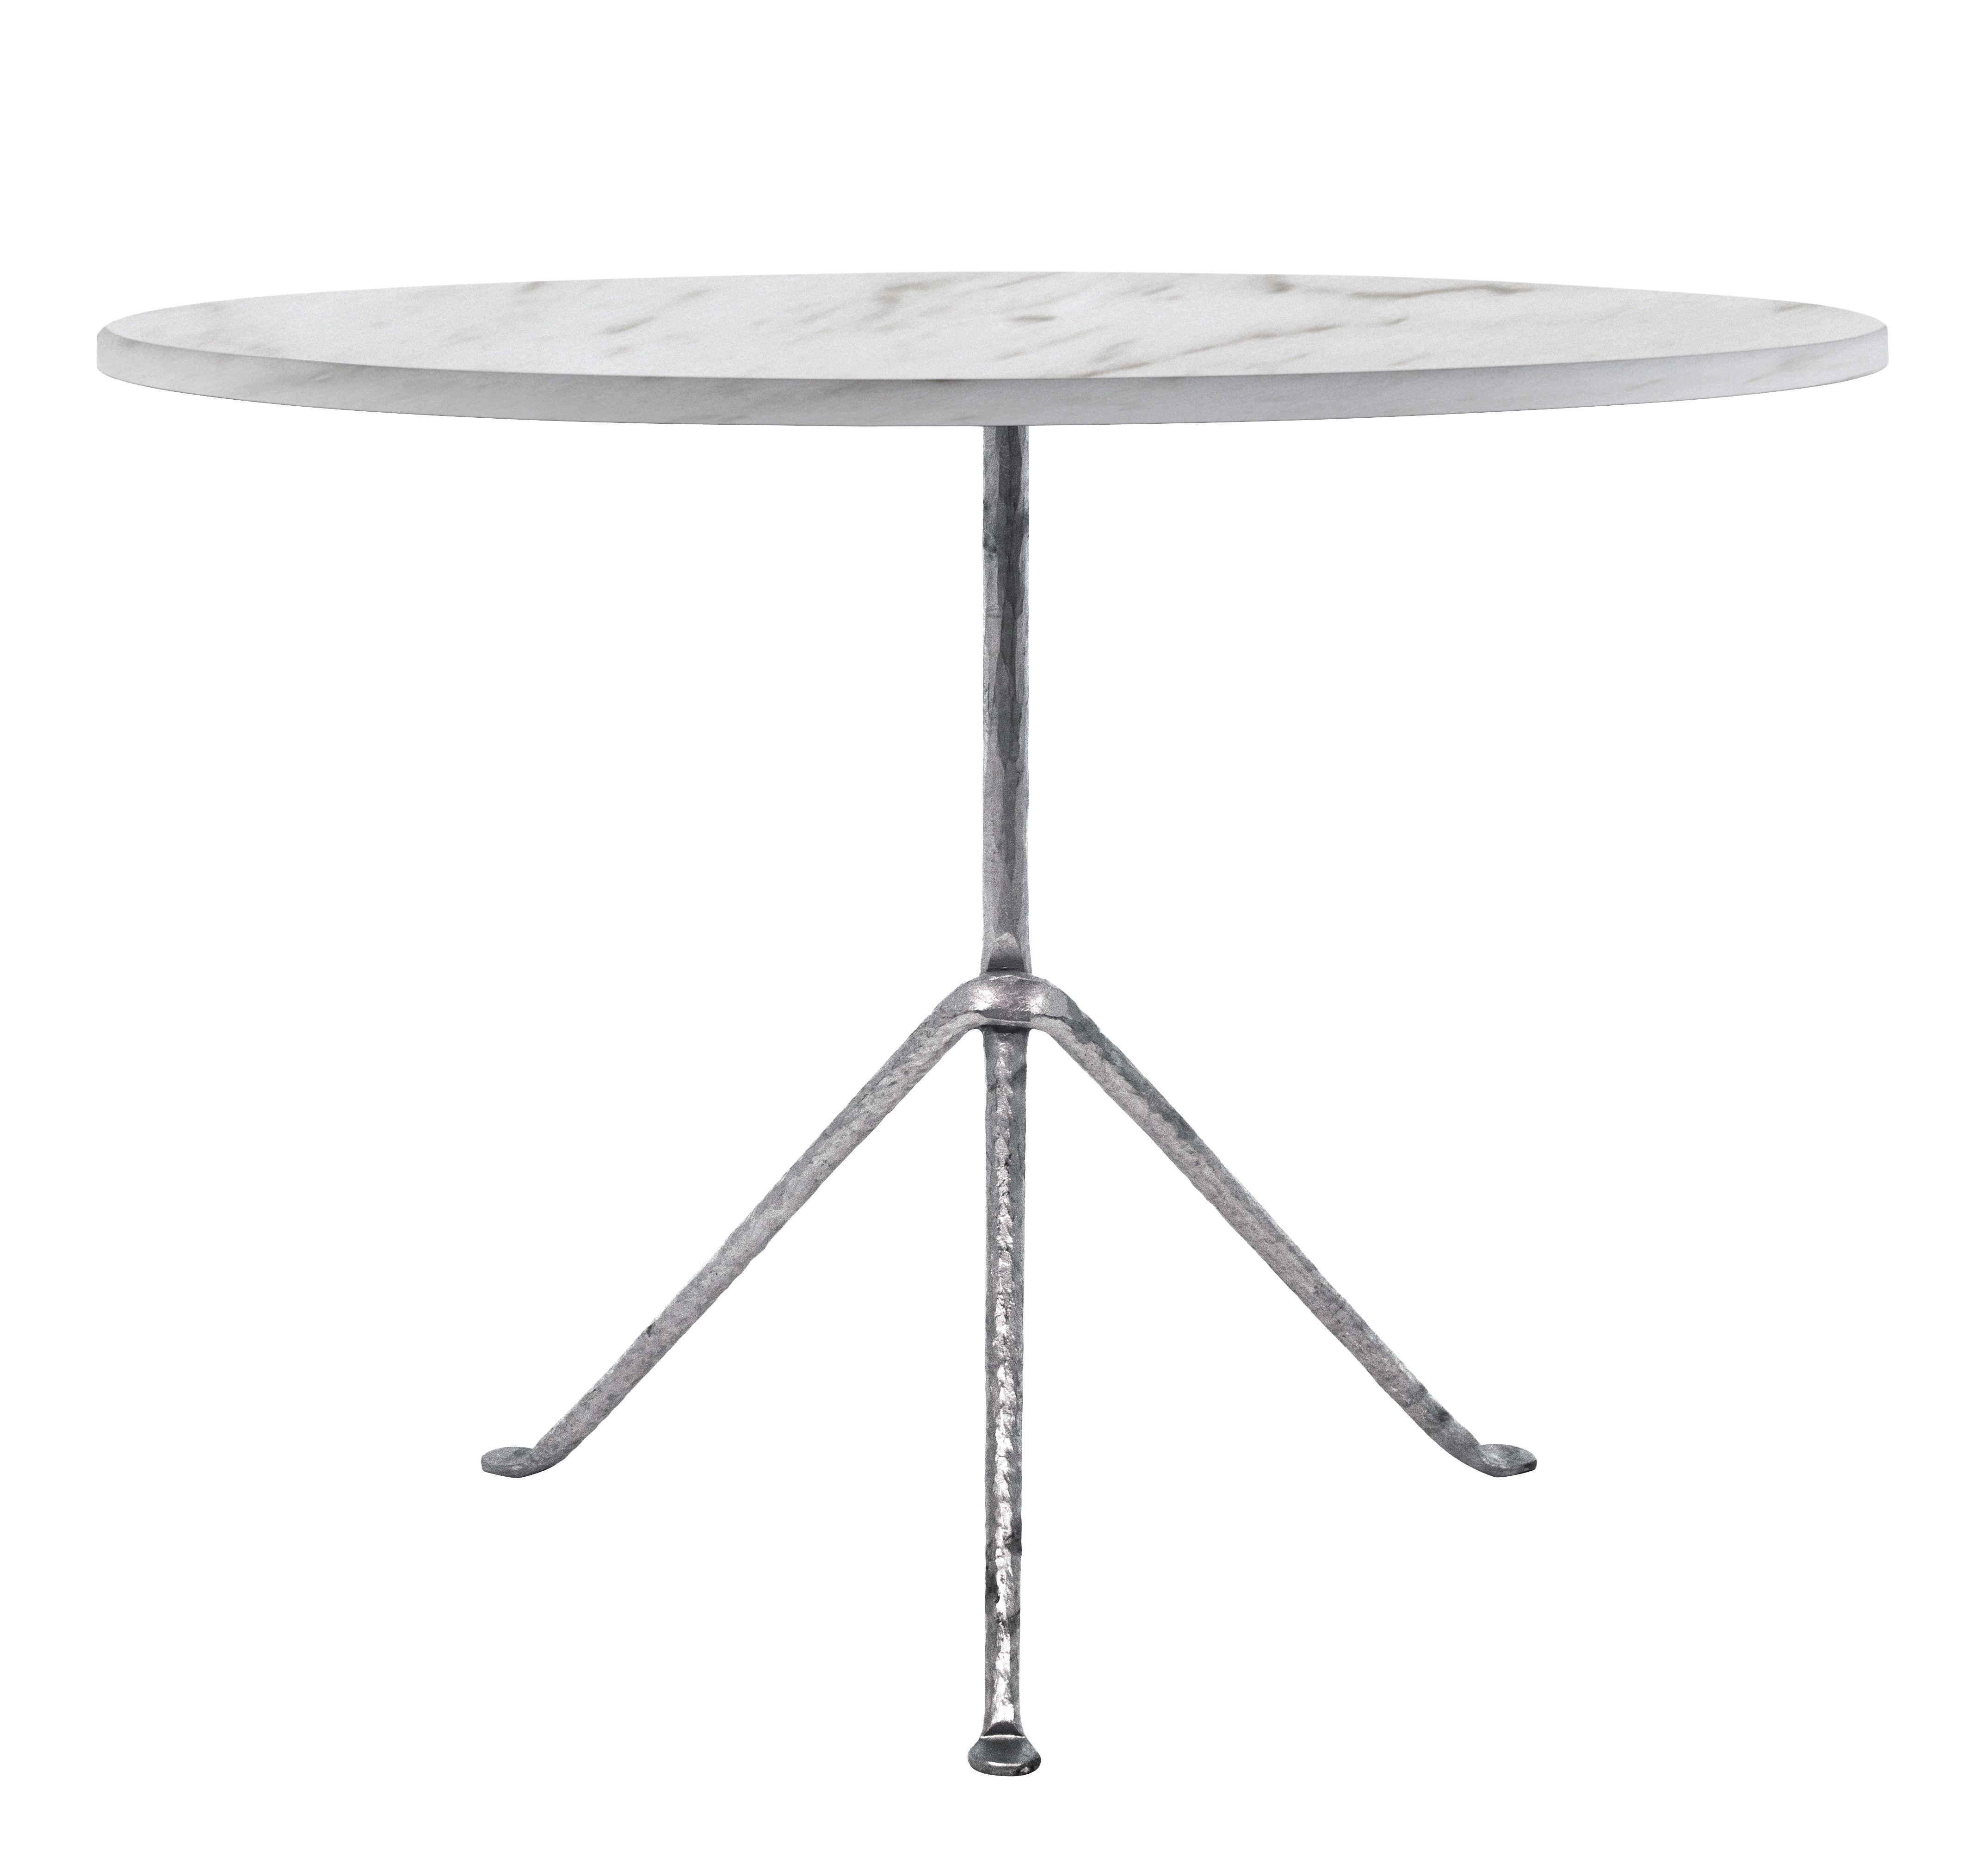 Table ronde Officina Outdoor Magis - Marbre blanc / Pieds galvanisés ...